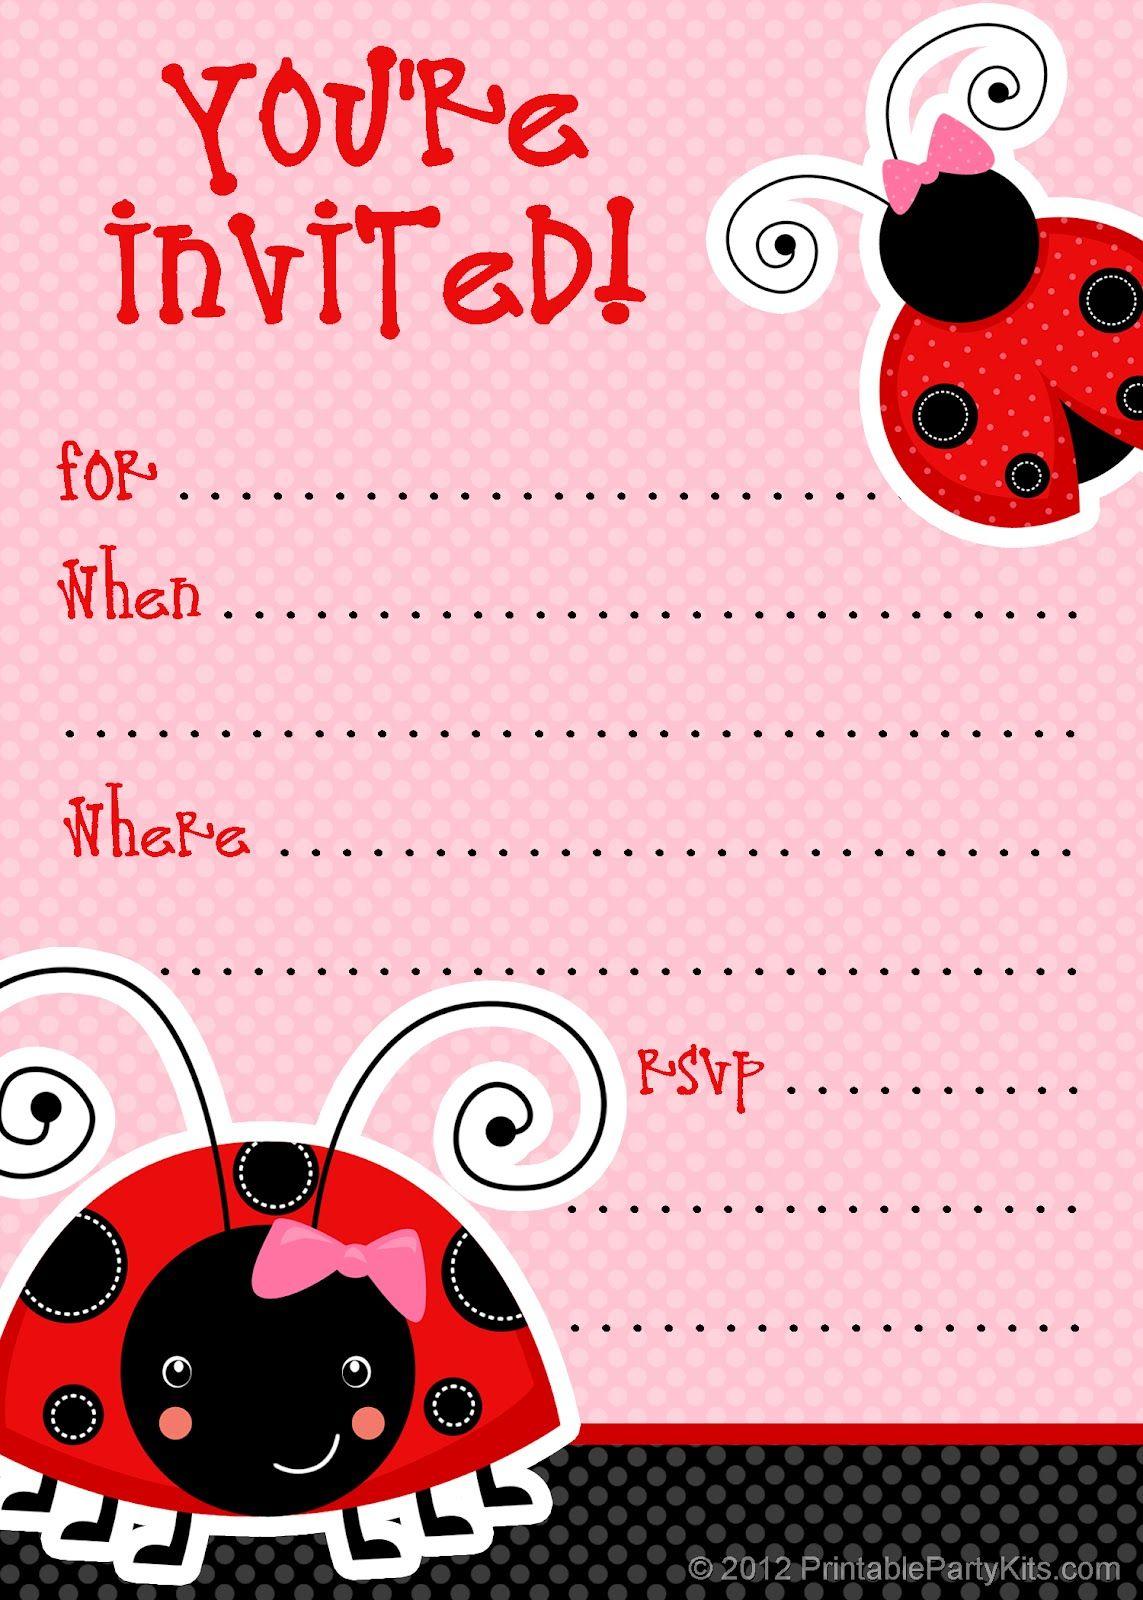 Free Printable Party Invitations: Free Ladybug Invite Template - Free Printable Ladybug Baby Shower Invitations Templates